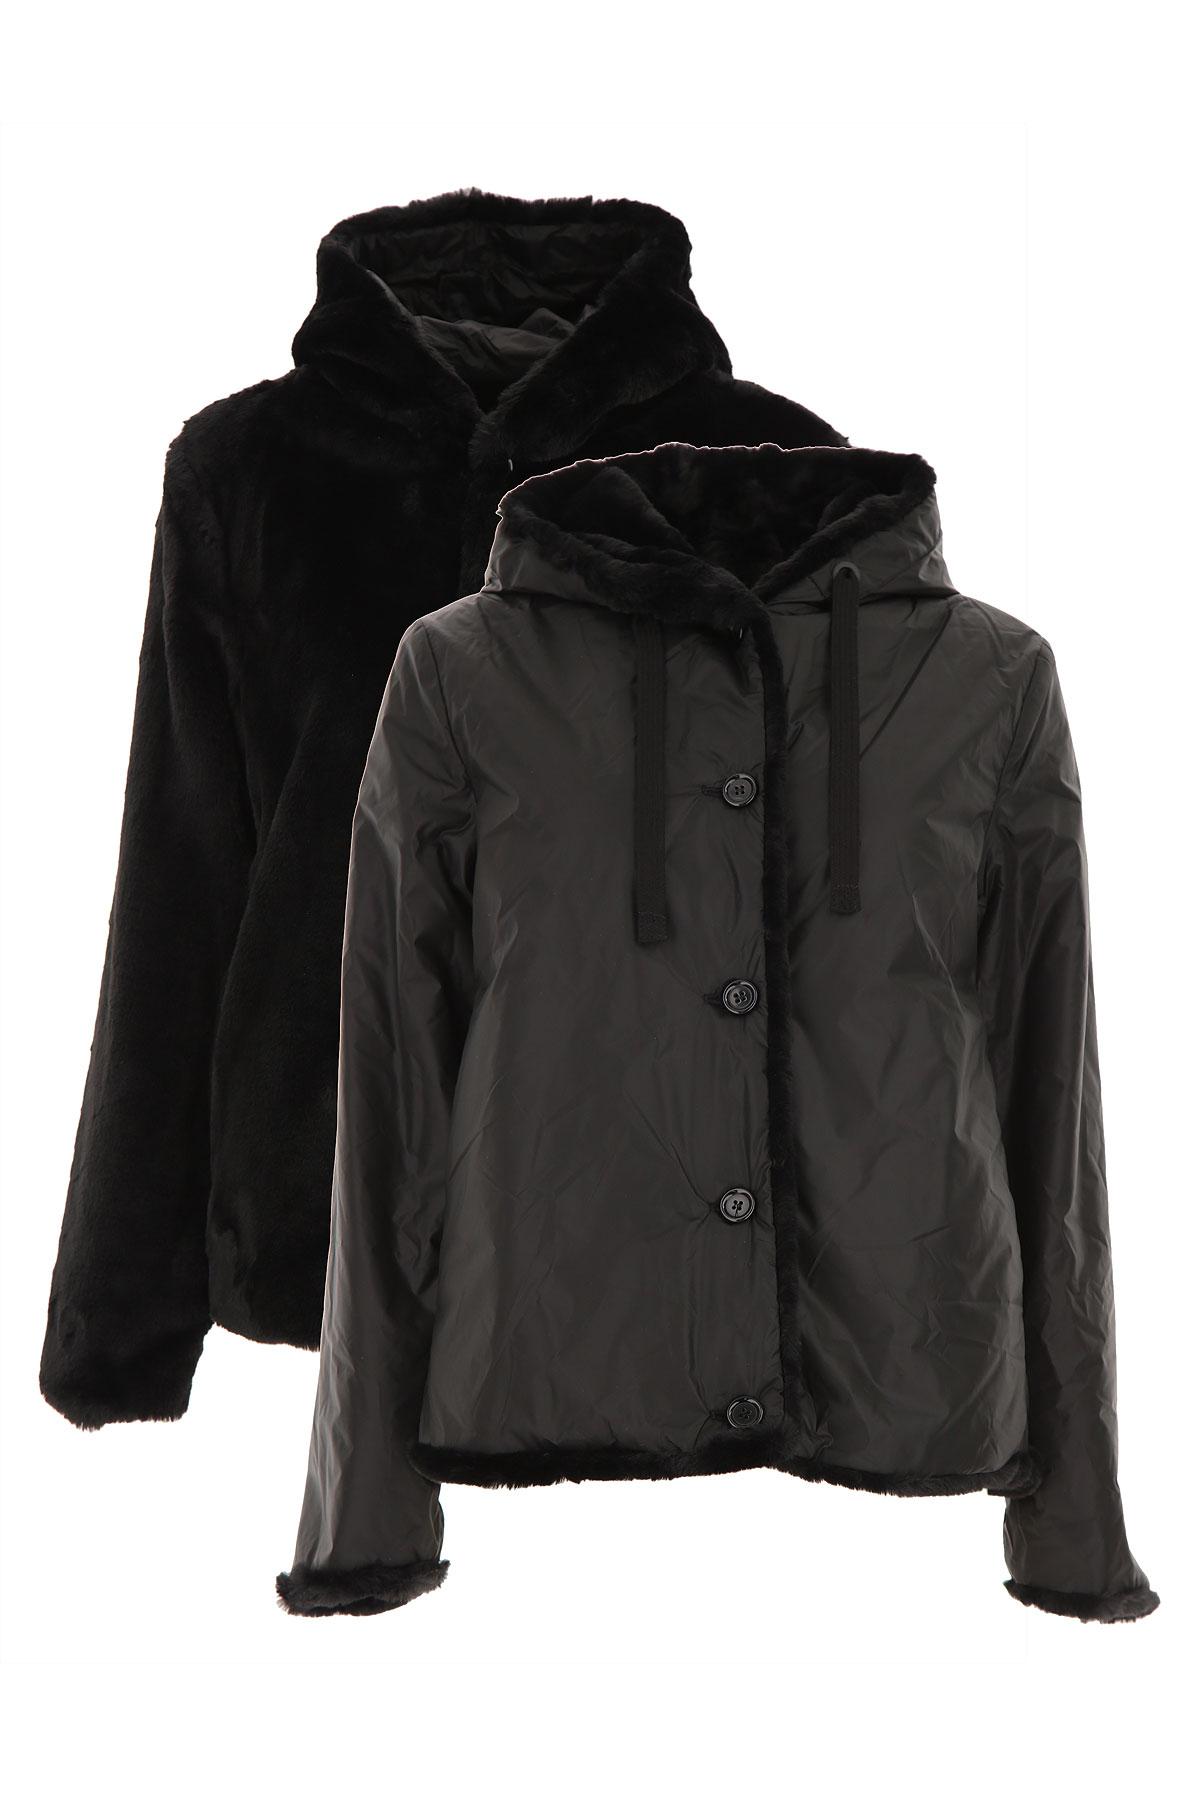 Aspesi Jacket for Women On Sale, Black, polyamide, 2019, 10 4 6 8